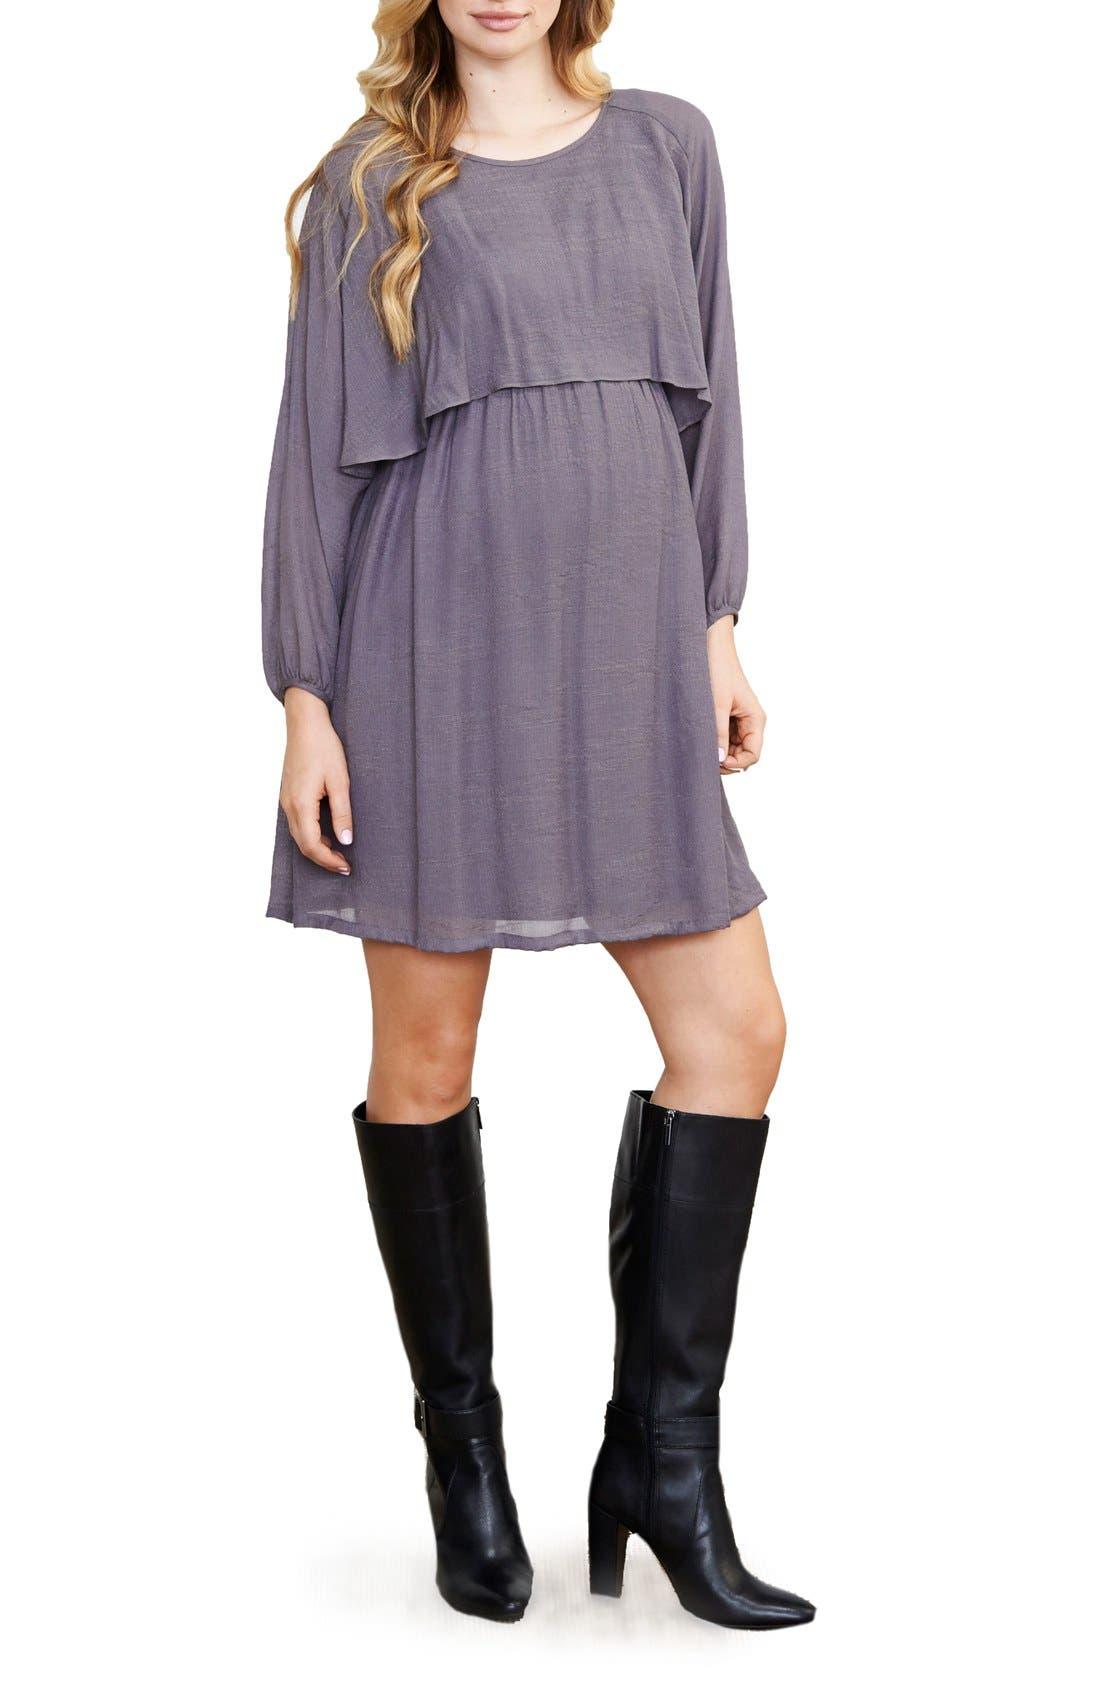 Alternate Image 1 Selected - Maternal America Blouson Maternity/Nursing Dress